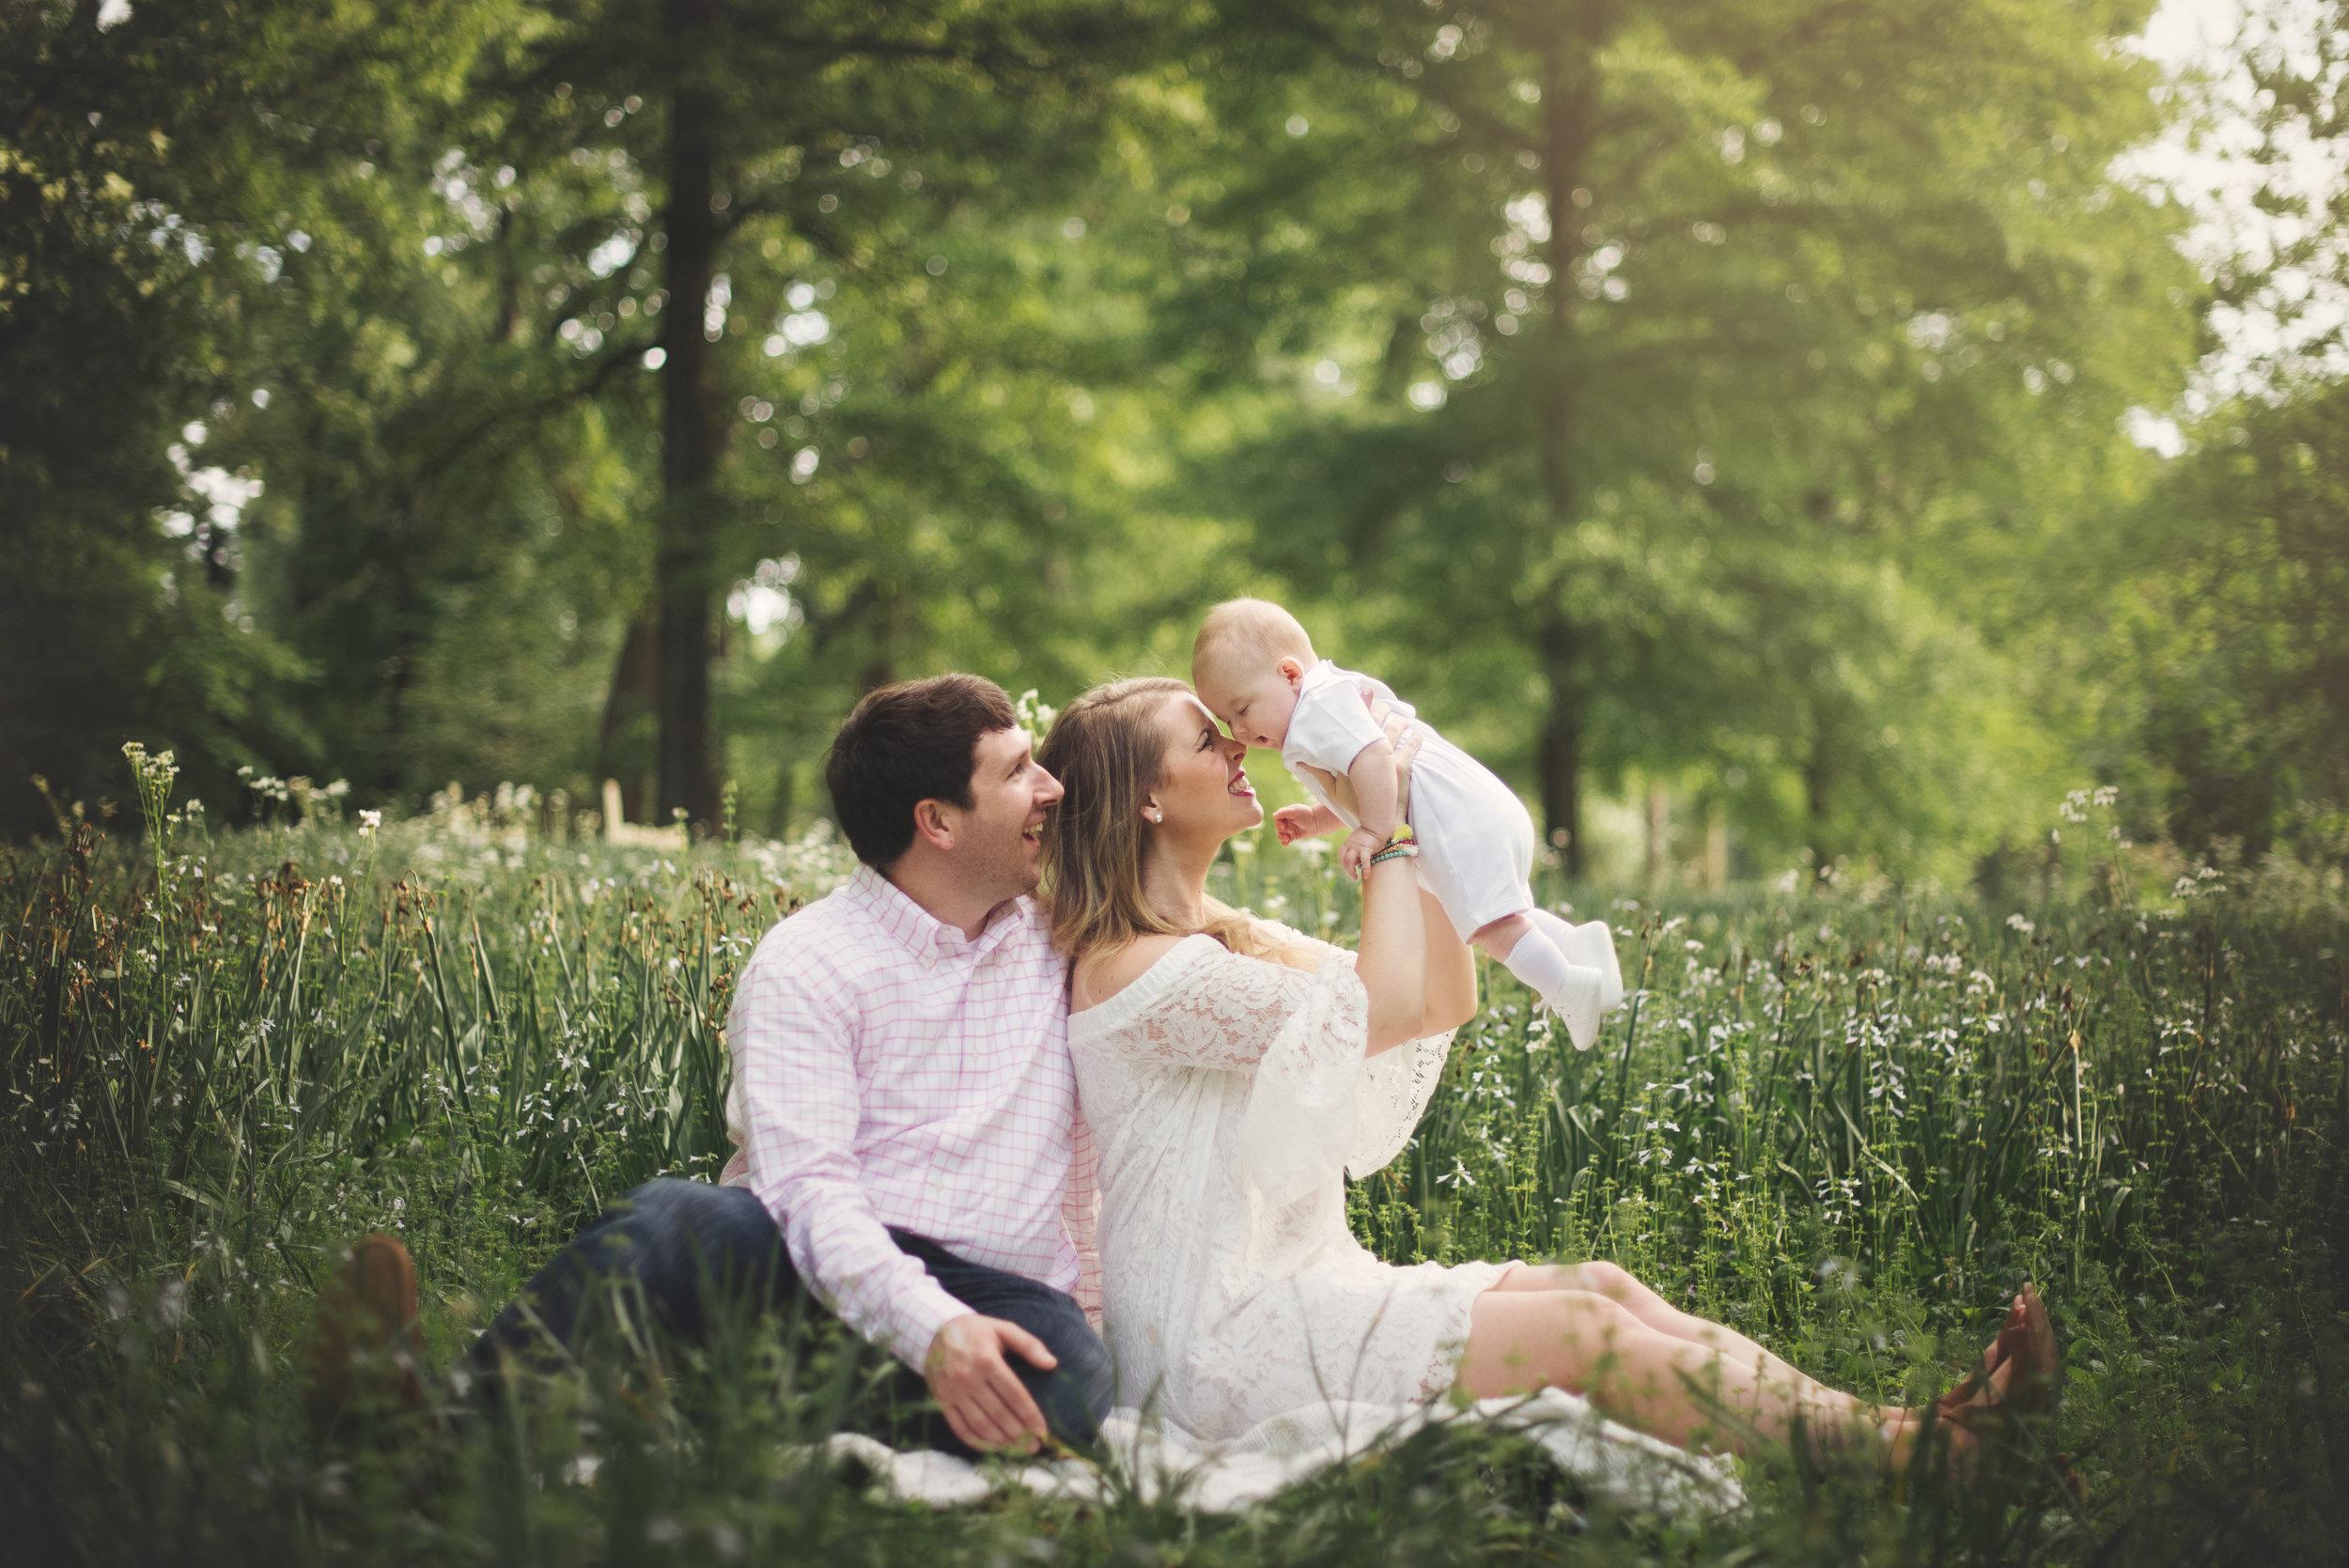 memphisfamilyphotographer-47.jpg